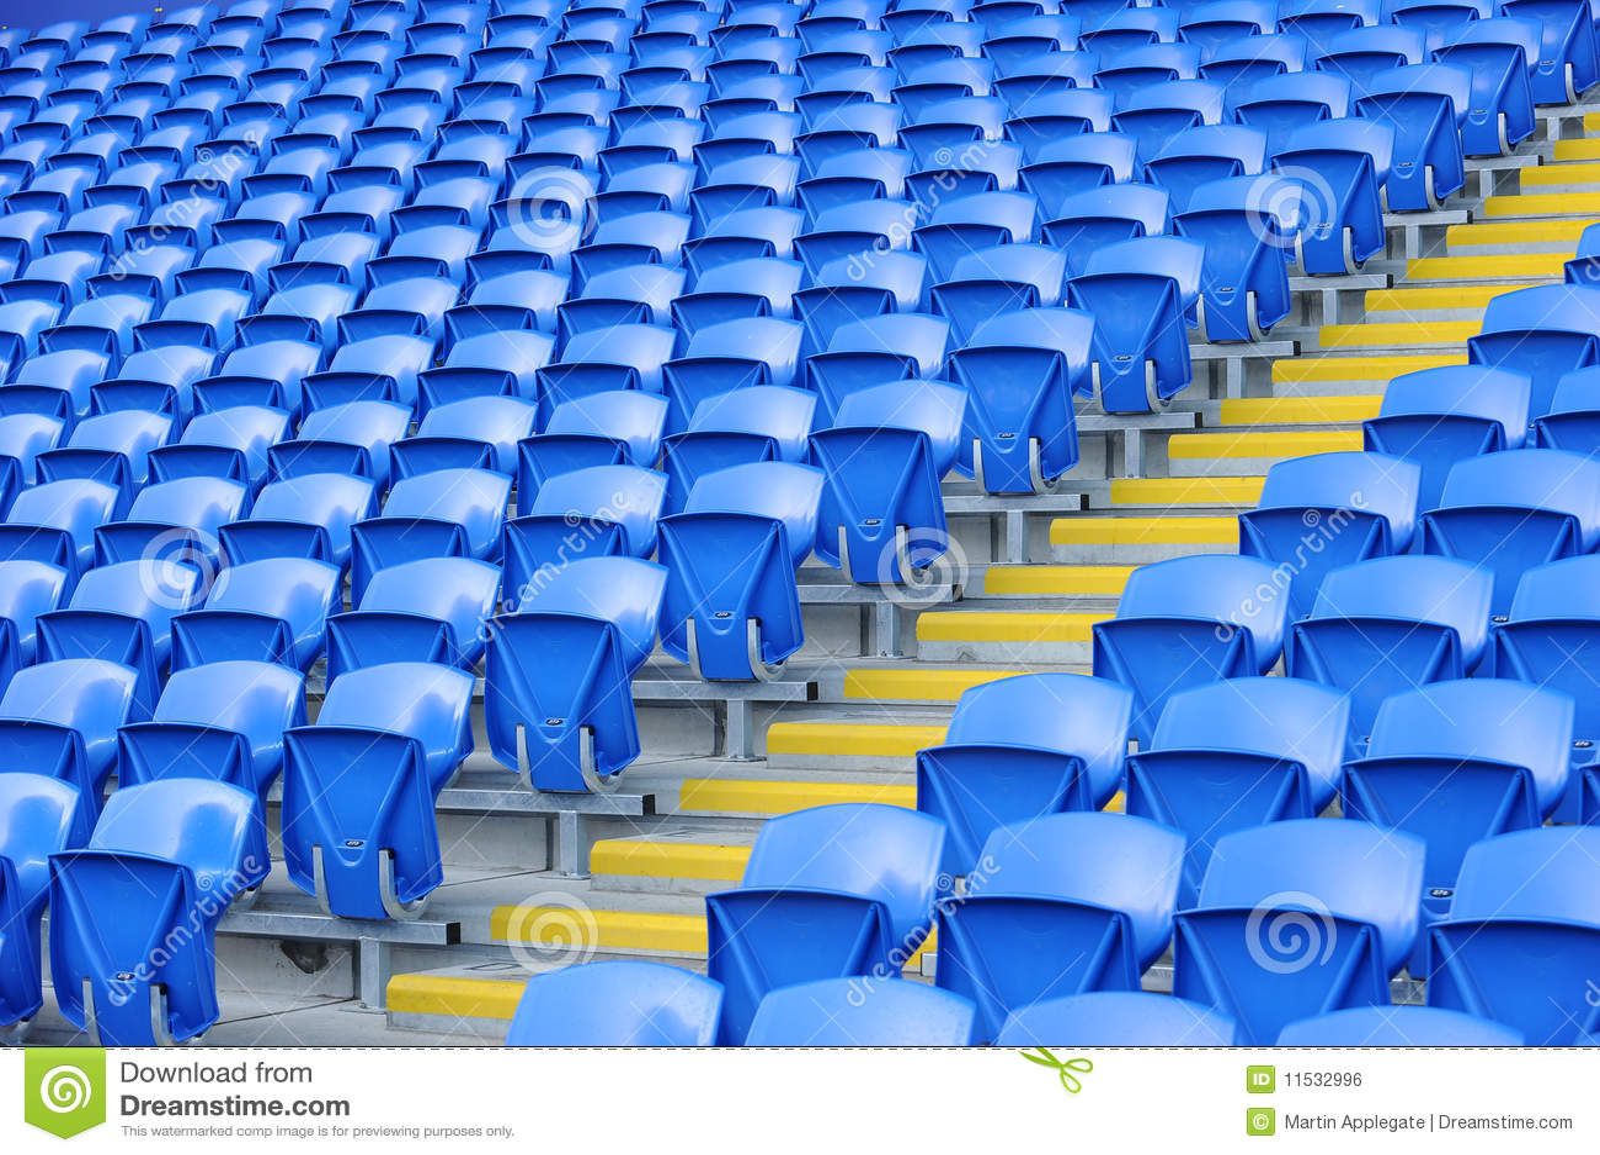 stadium seating stock photo  image of arena  colorful